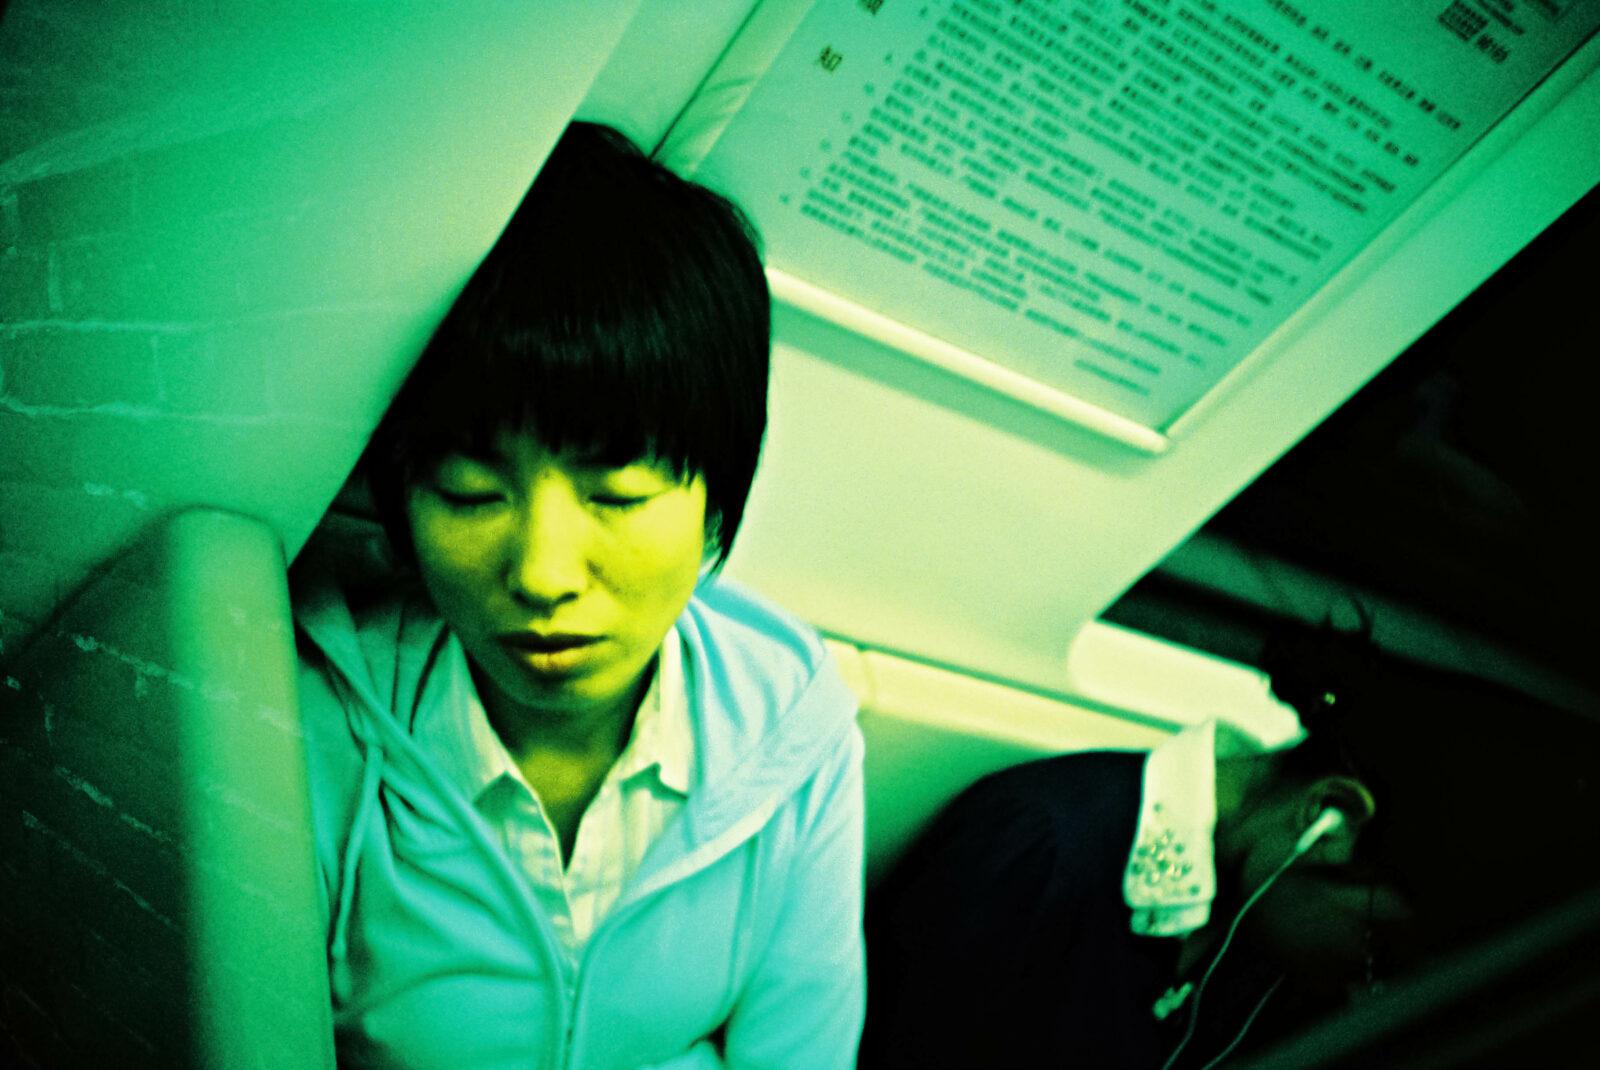 instaCDV 15 China roll06 BeijingFlyWall 000042